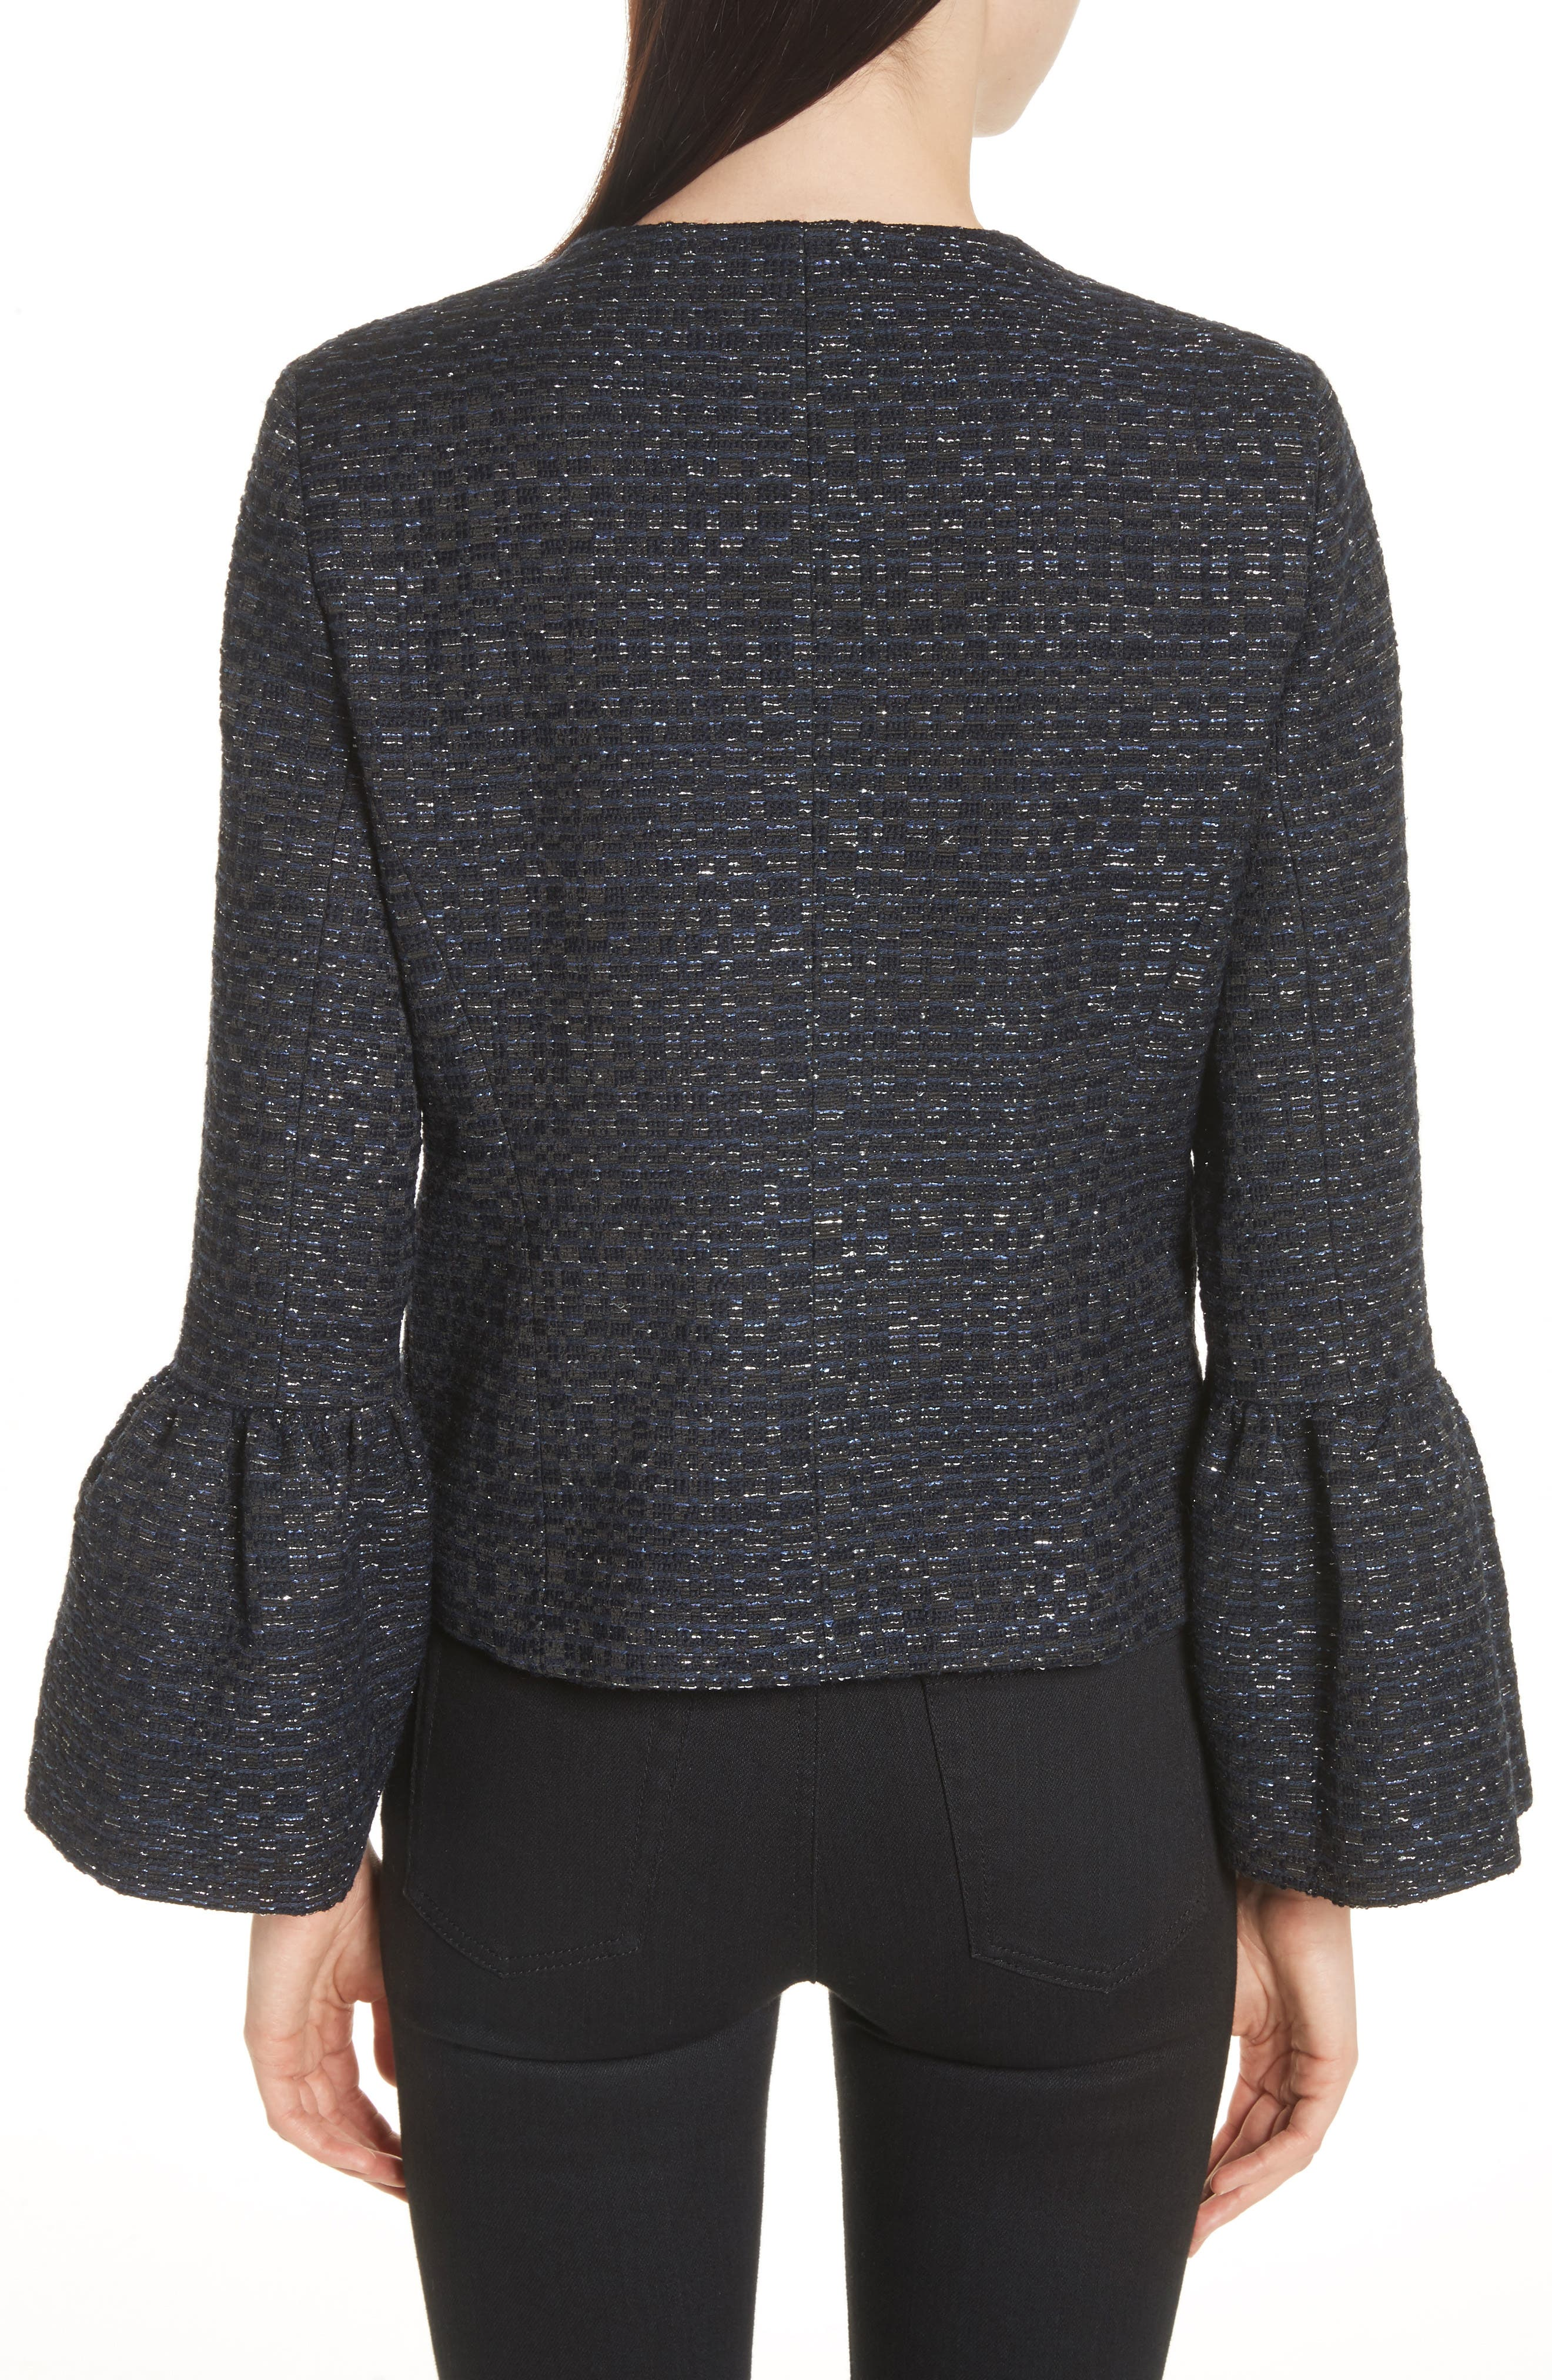 Alternate Image 2  - Helene Berman Zoe Bell Cuff Tweed Jacket